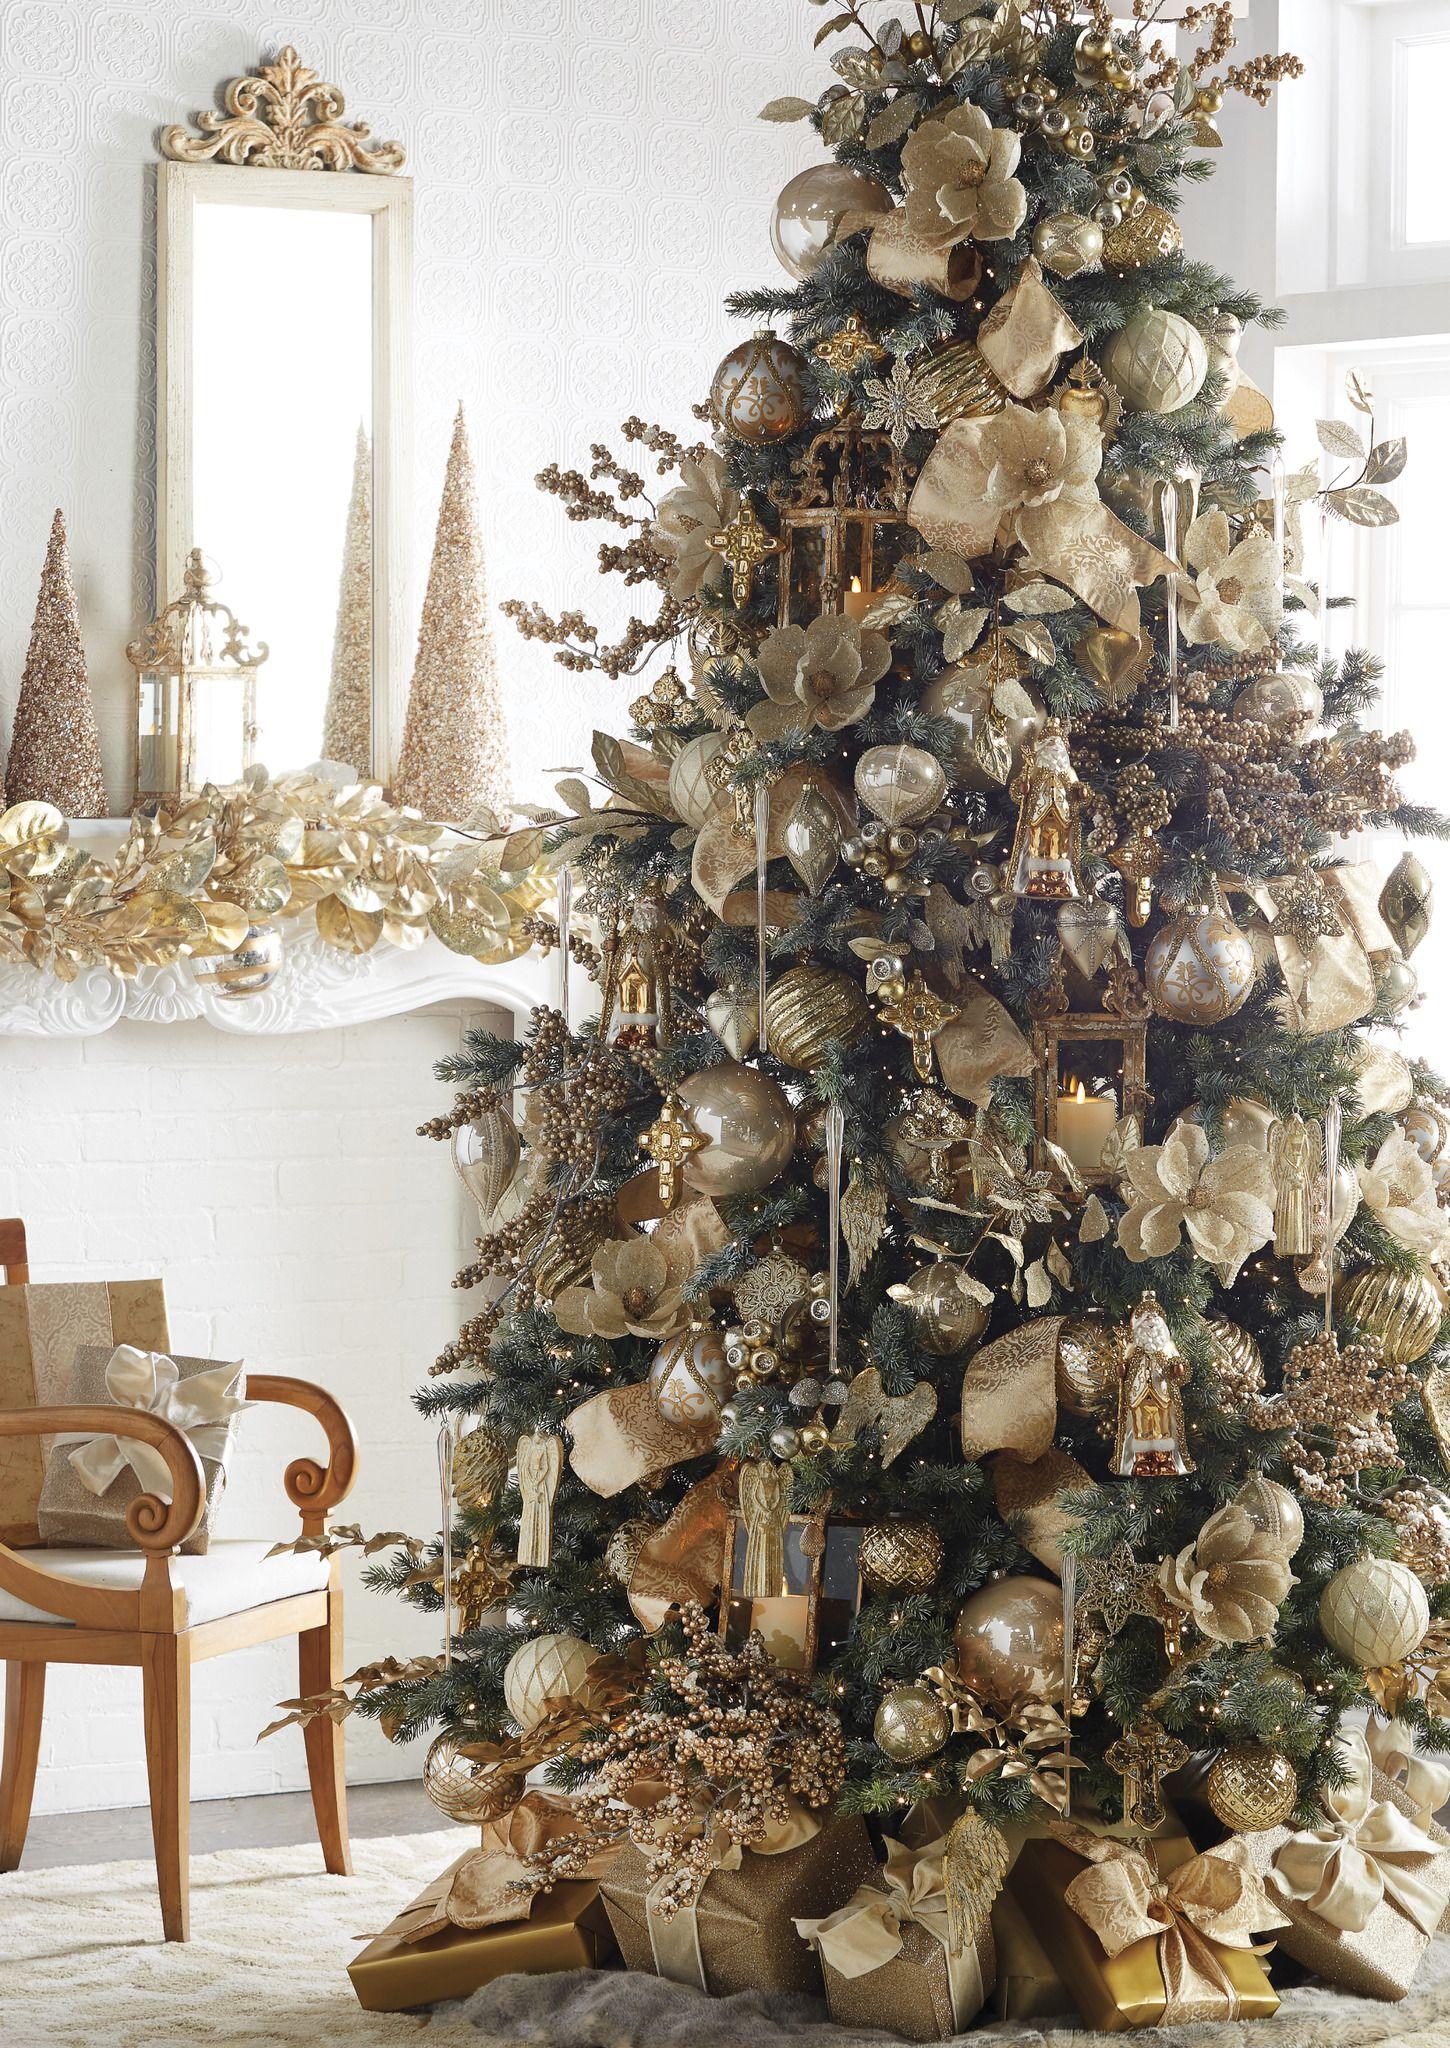 2019 RAZ Christmas Tree Inspiration